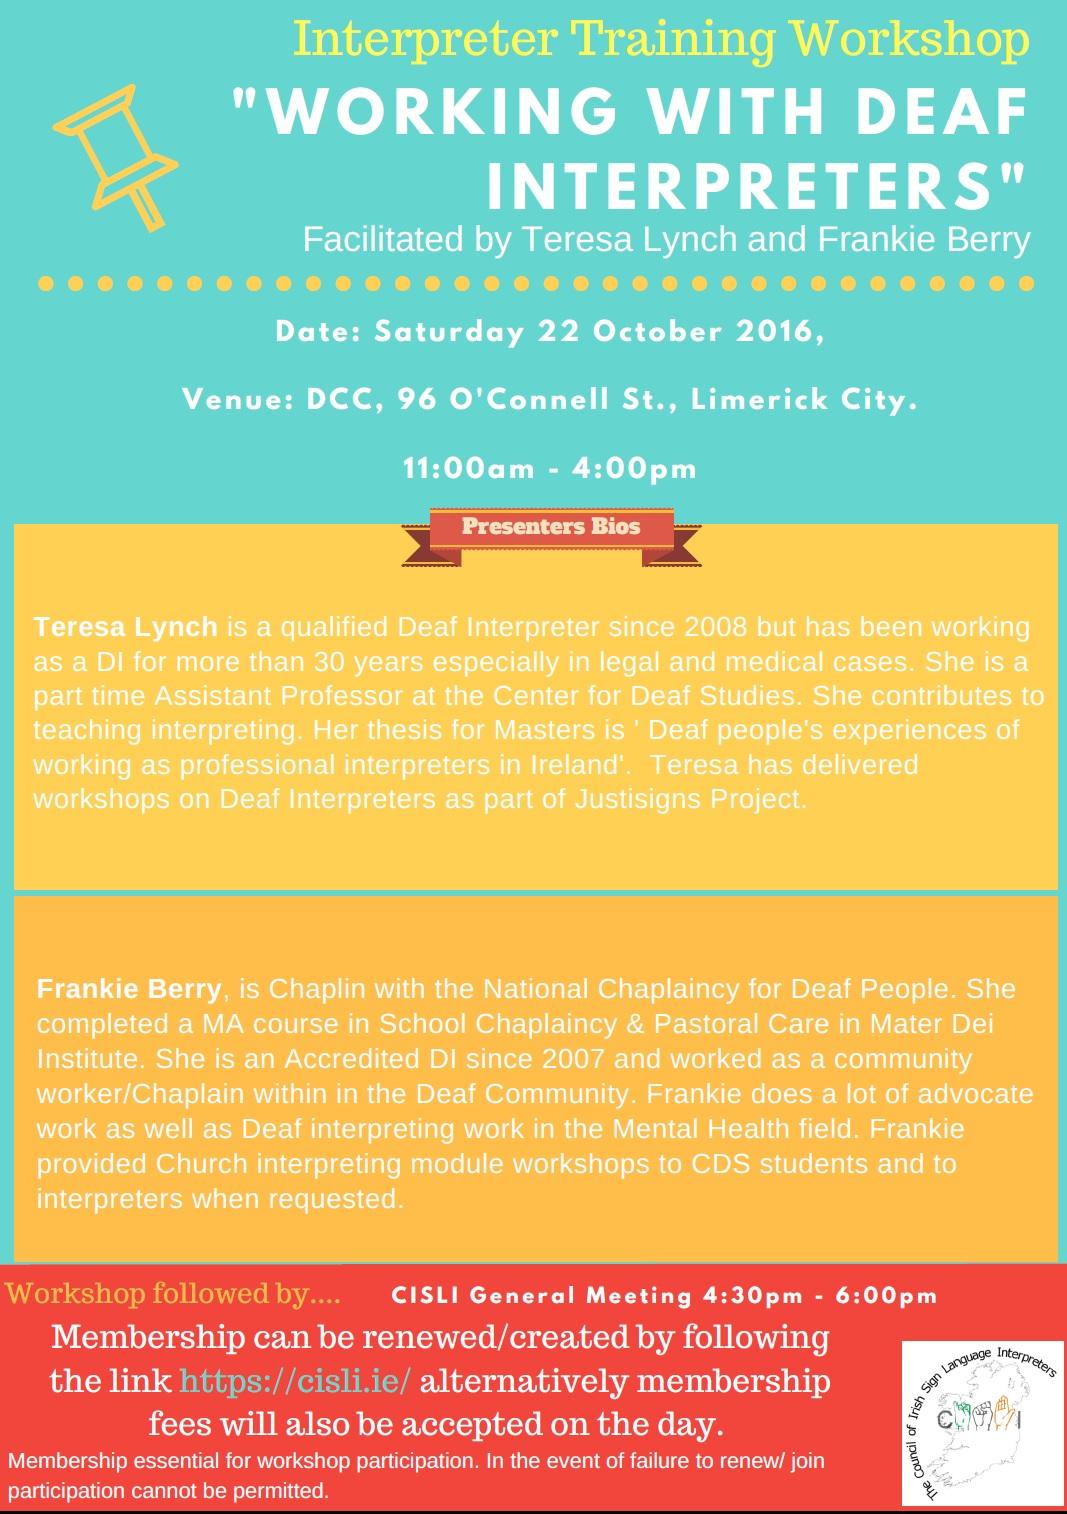 CISLI Workshop 22 Oct Limerick - Working with Deaf Interpreters - Poster.jpg